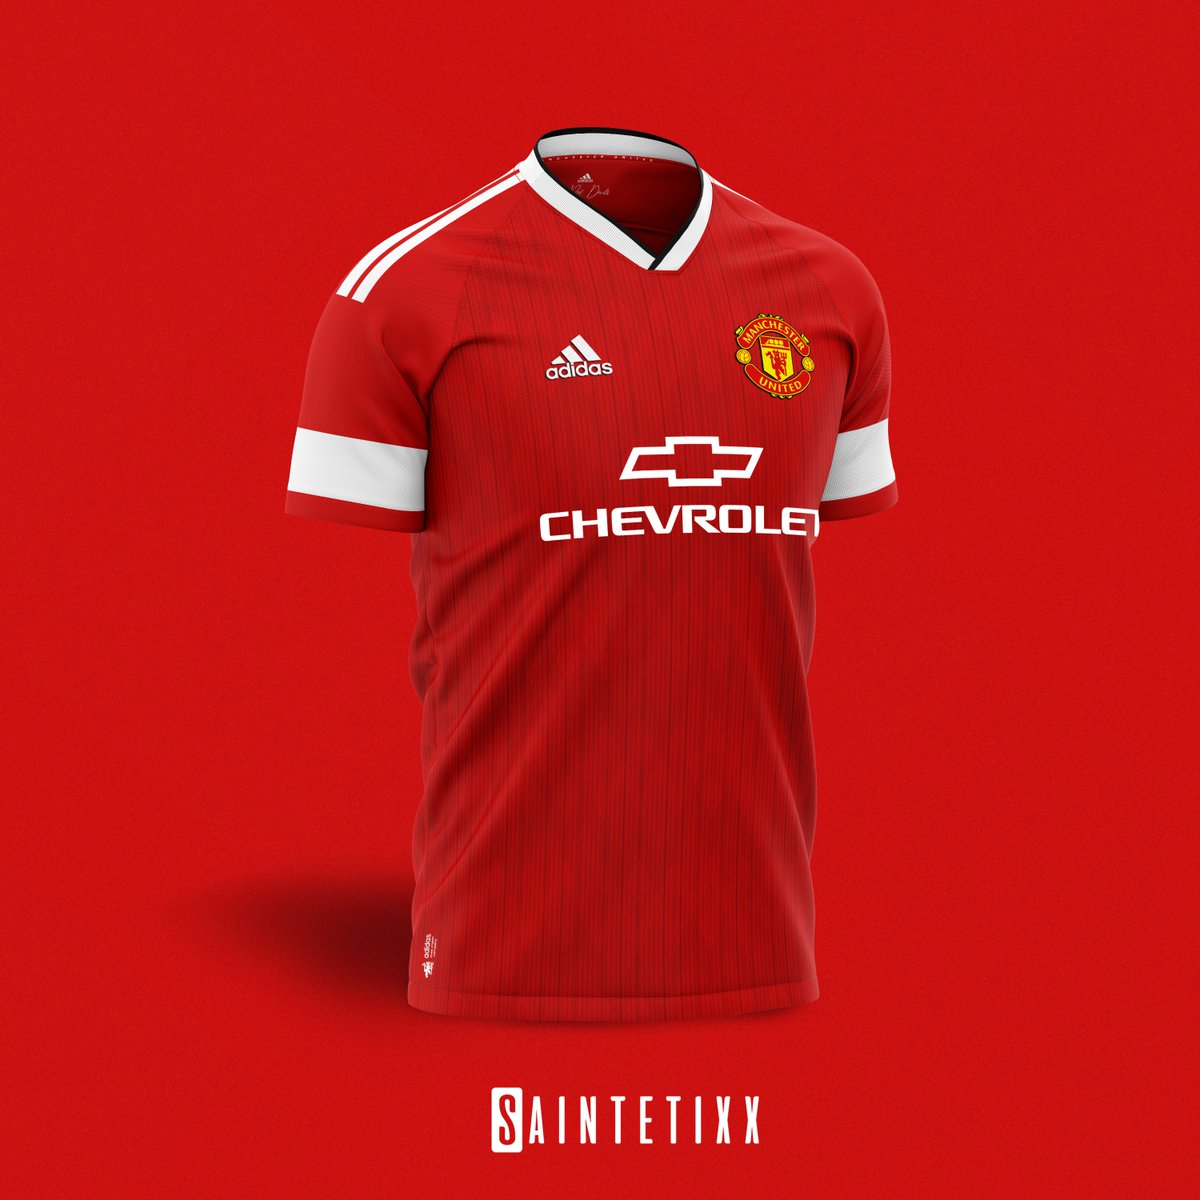 Saintetixx On Twitter Manchester United X Adidas Concept 20 21 Manchesterunited Manu United Manchester Mufc Pogba